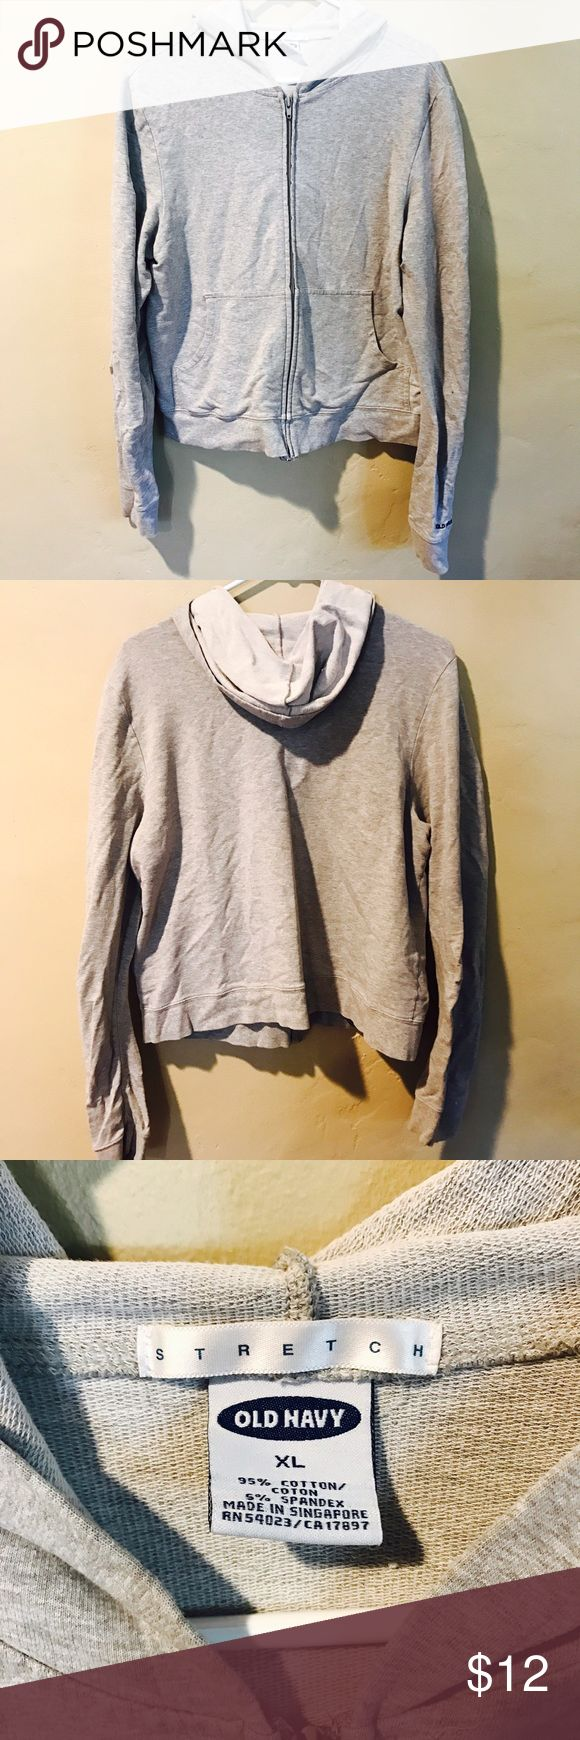 Old Navy Zip Up Grey Hoodie Old Navy Zip Up Grey Hoodie. Women's XL but fits M-L Old Navy Tops Sweatshirts & Hoodies